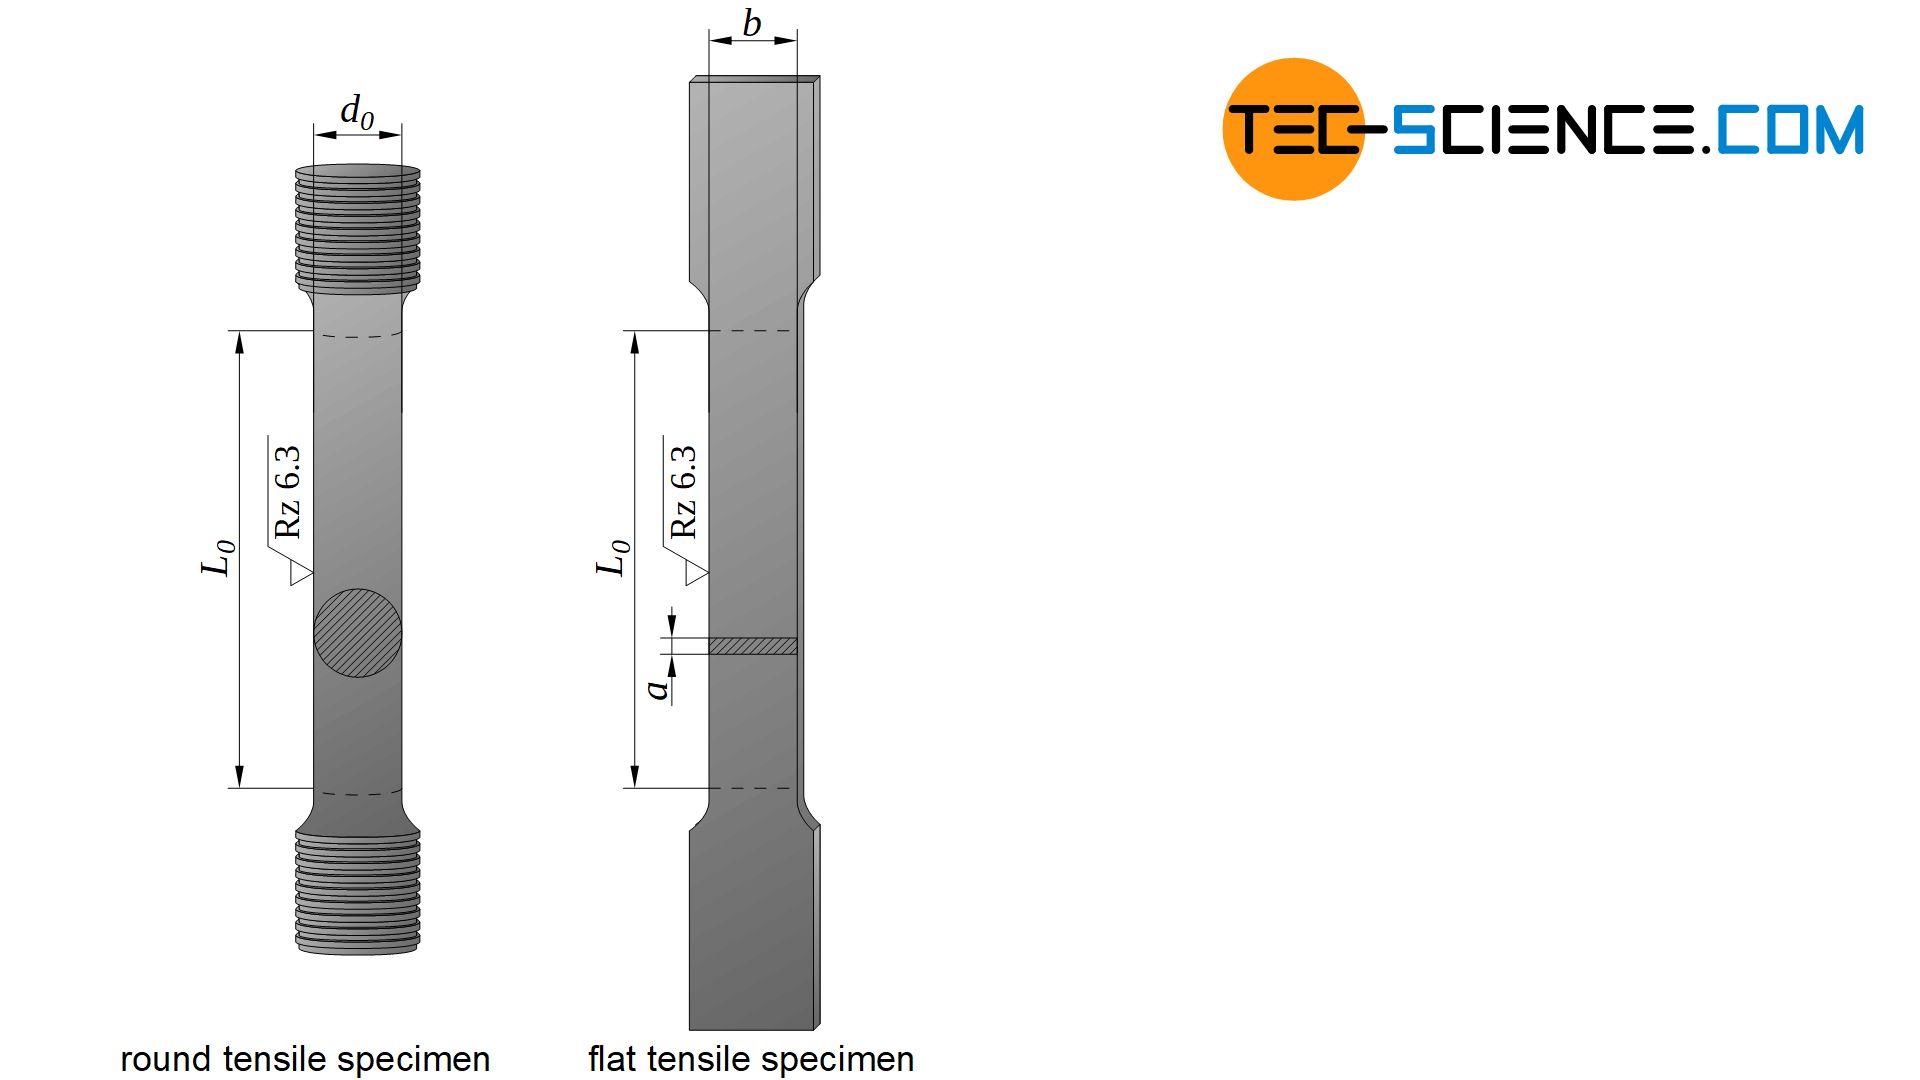 Types of tensile test specimens